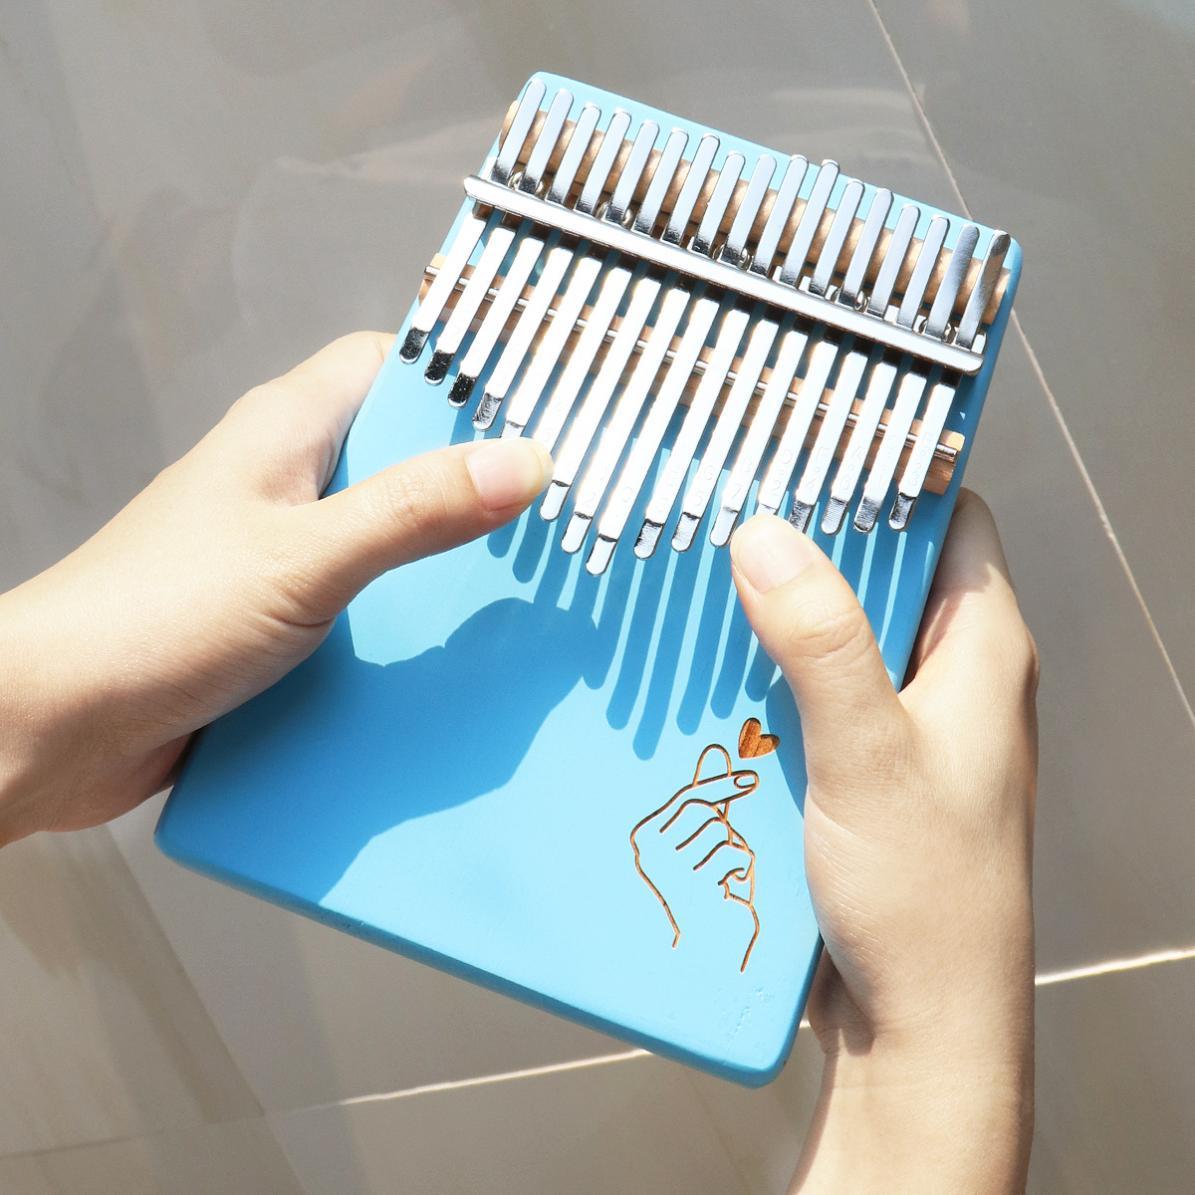 Thumb Piano 17 Keys Kalimba Blue Finger Heart Pattern Solid Single Board Pine Mbira Mini Keyboard Instrument enlarge